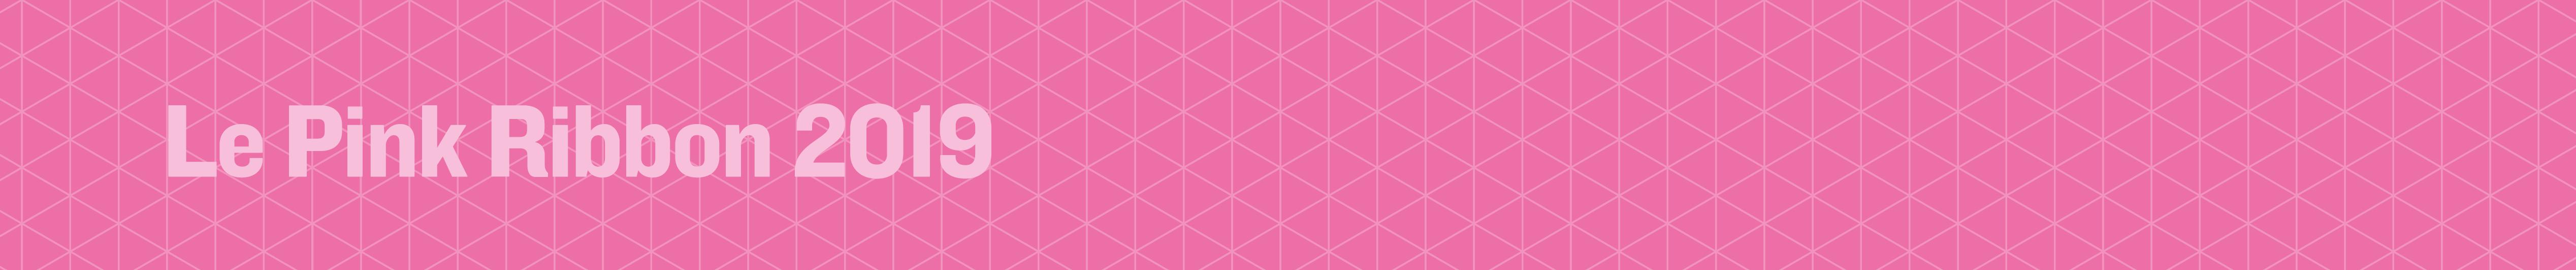 20190920 Banner Pink Ribbon FR